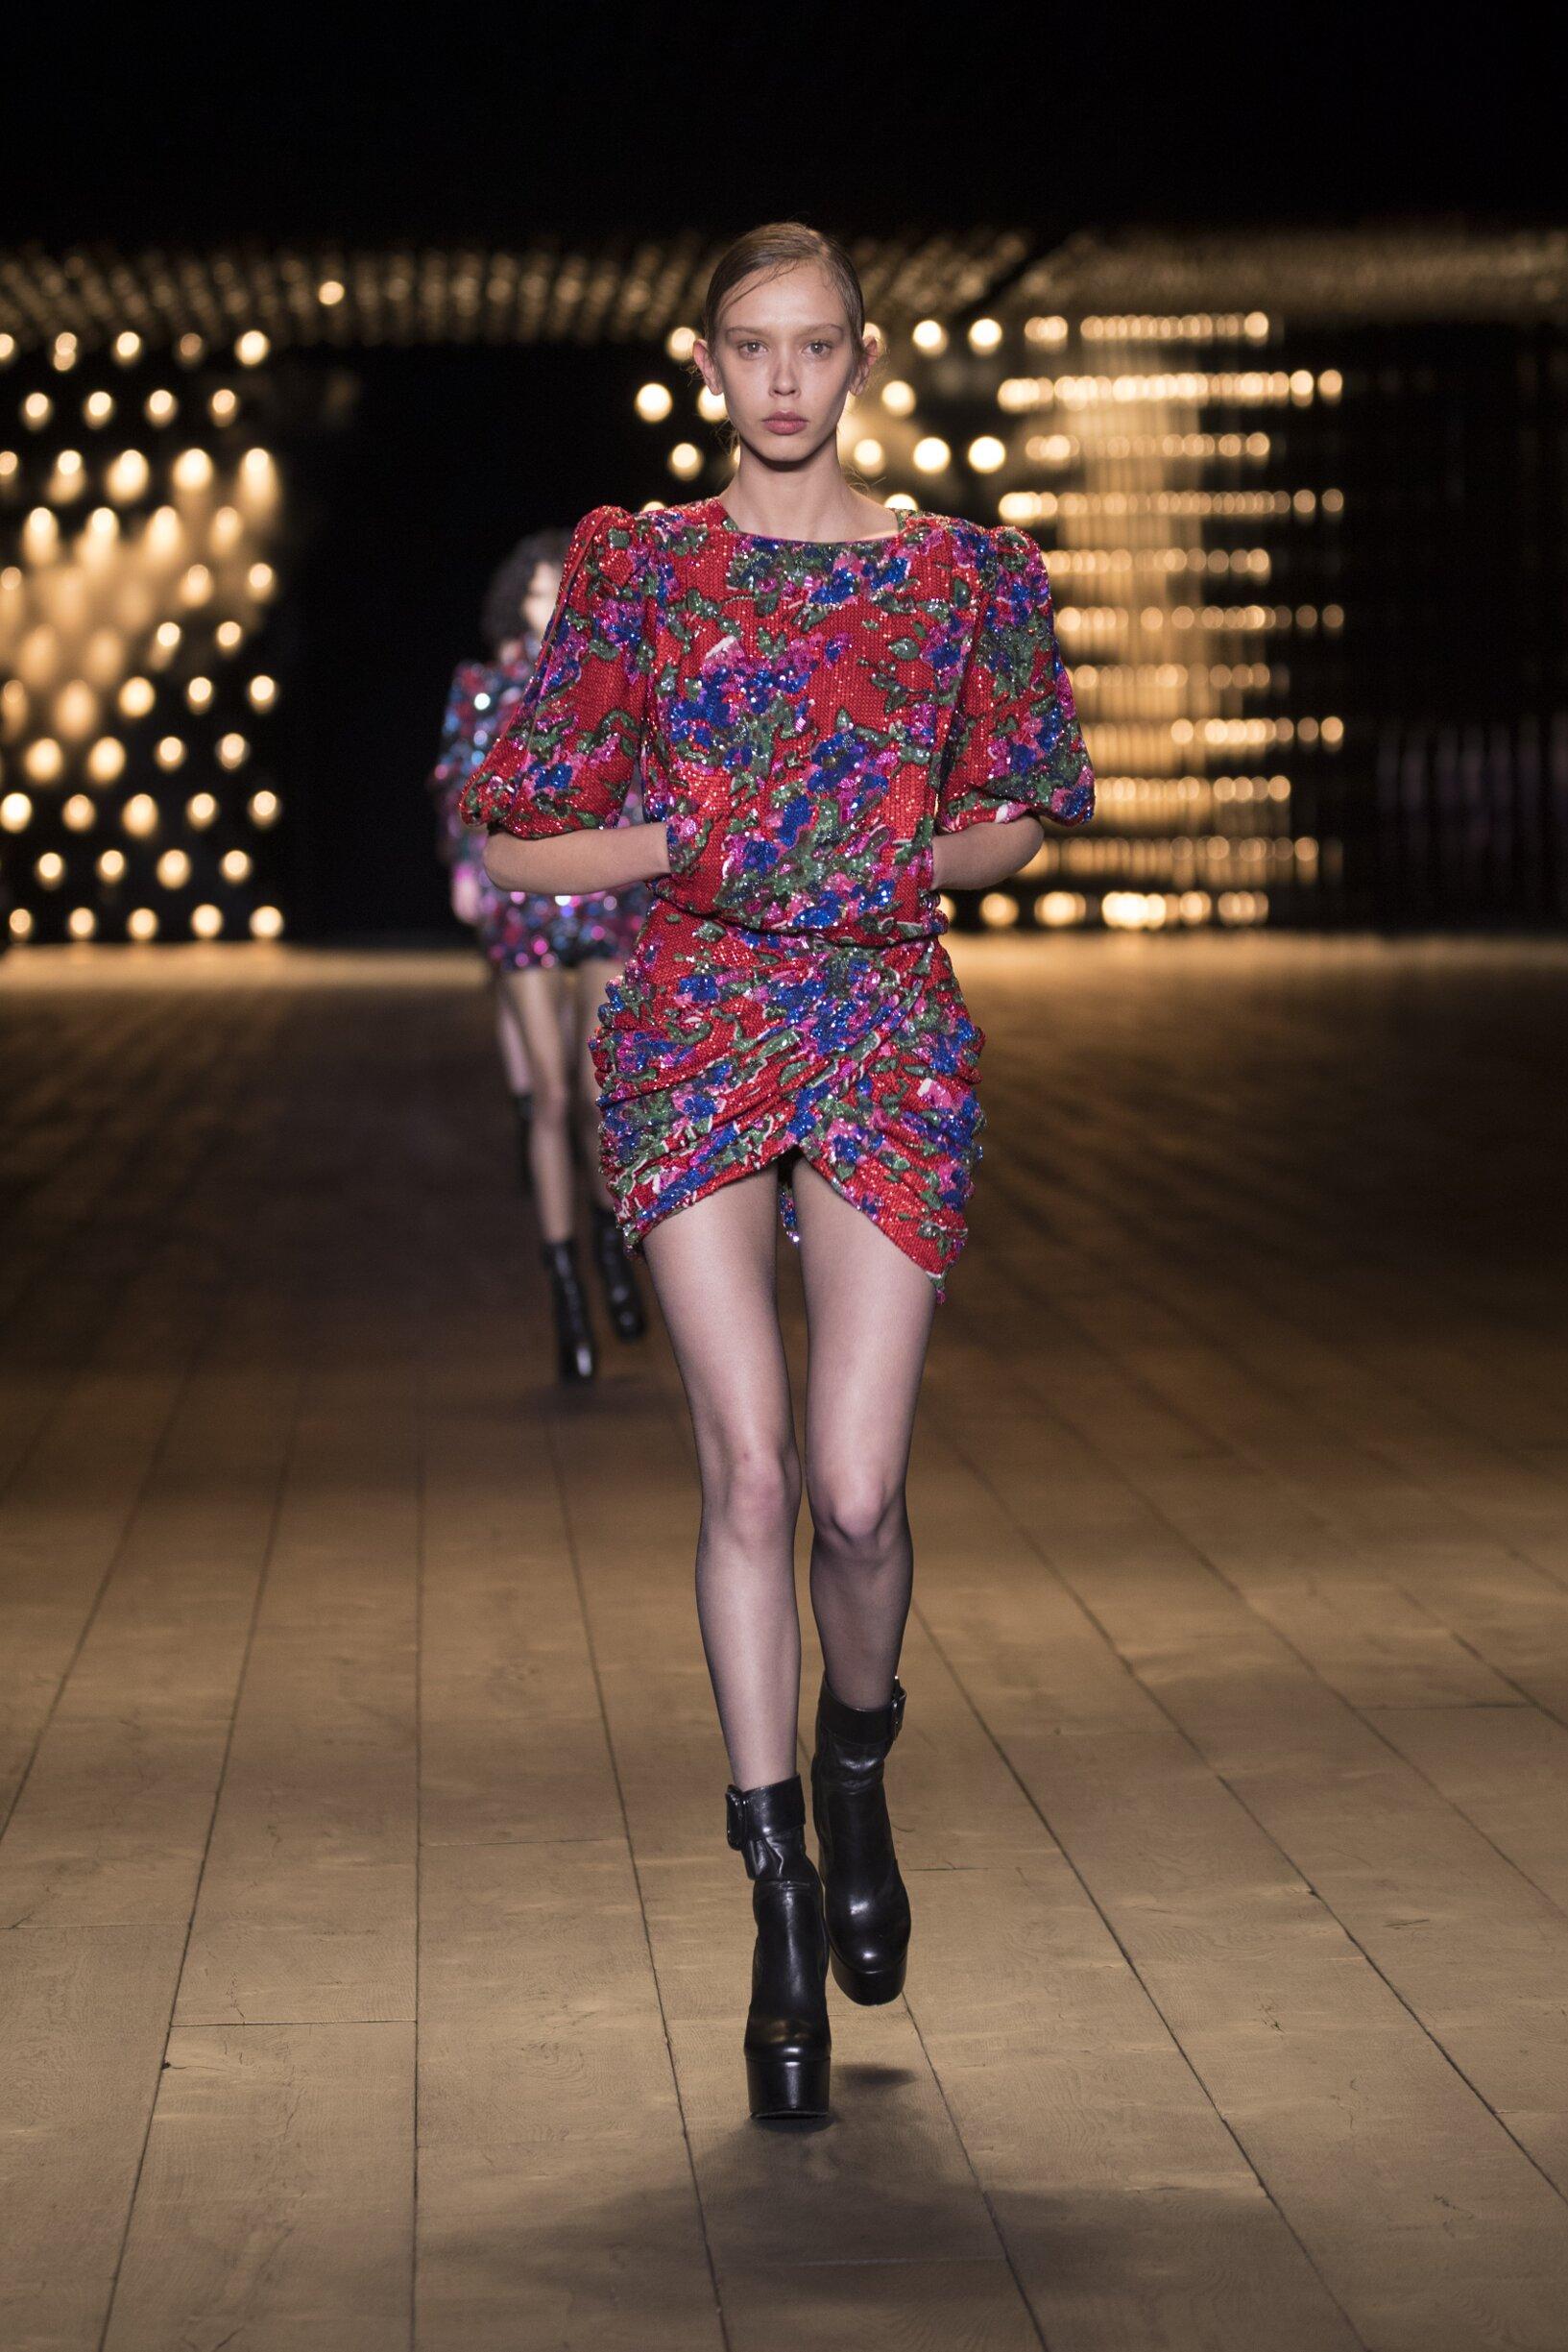 Womenswear Fashion 2018-19 Catwalk Saint Laurent